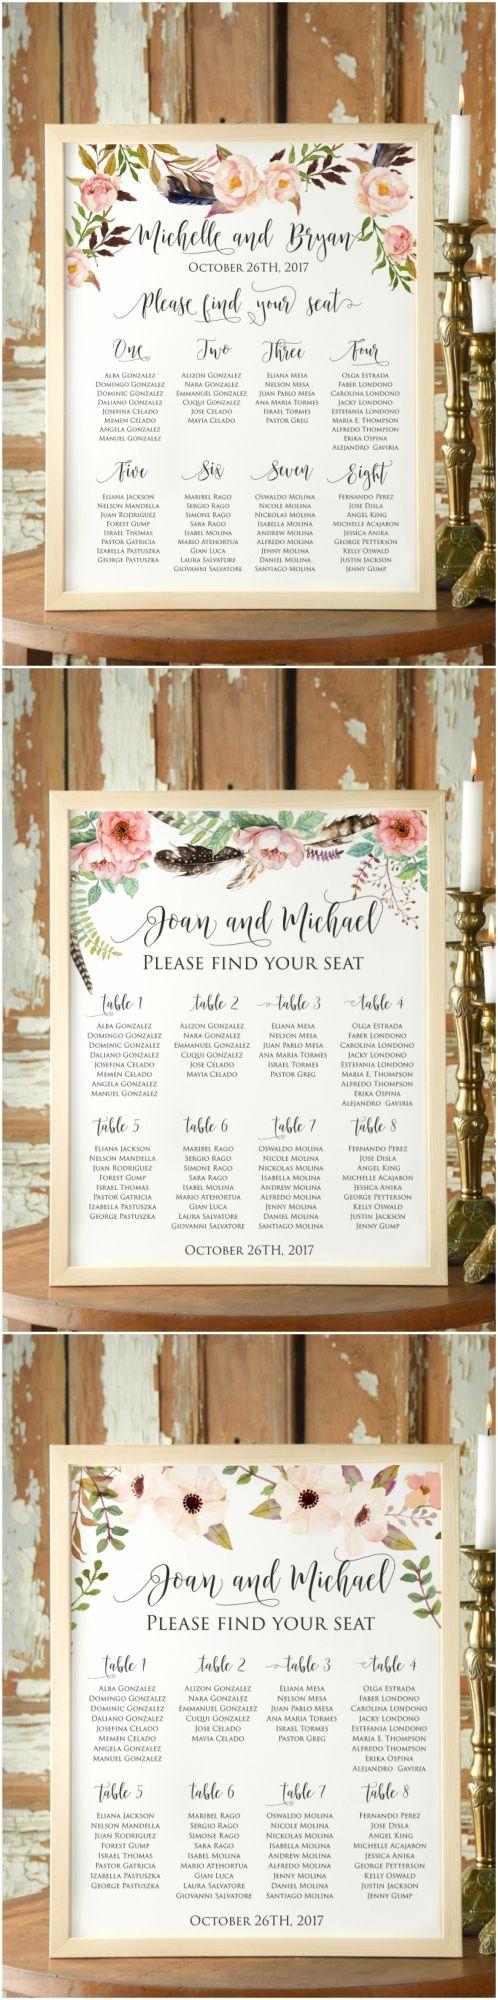 Boho Floral Wedding Table Plans #weddingideas #weddingstationery #weddingplanning #boho #floral #flowers #rustic #calligraphy